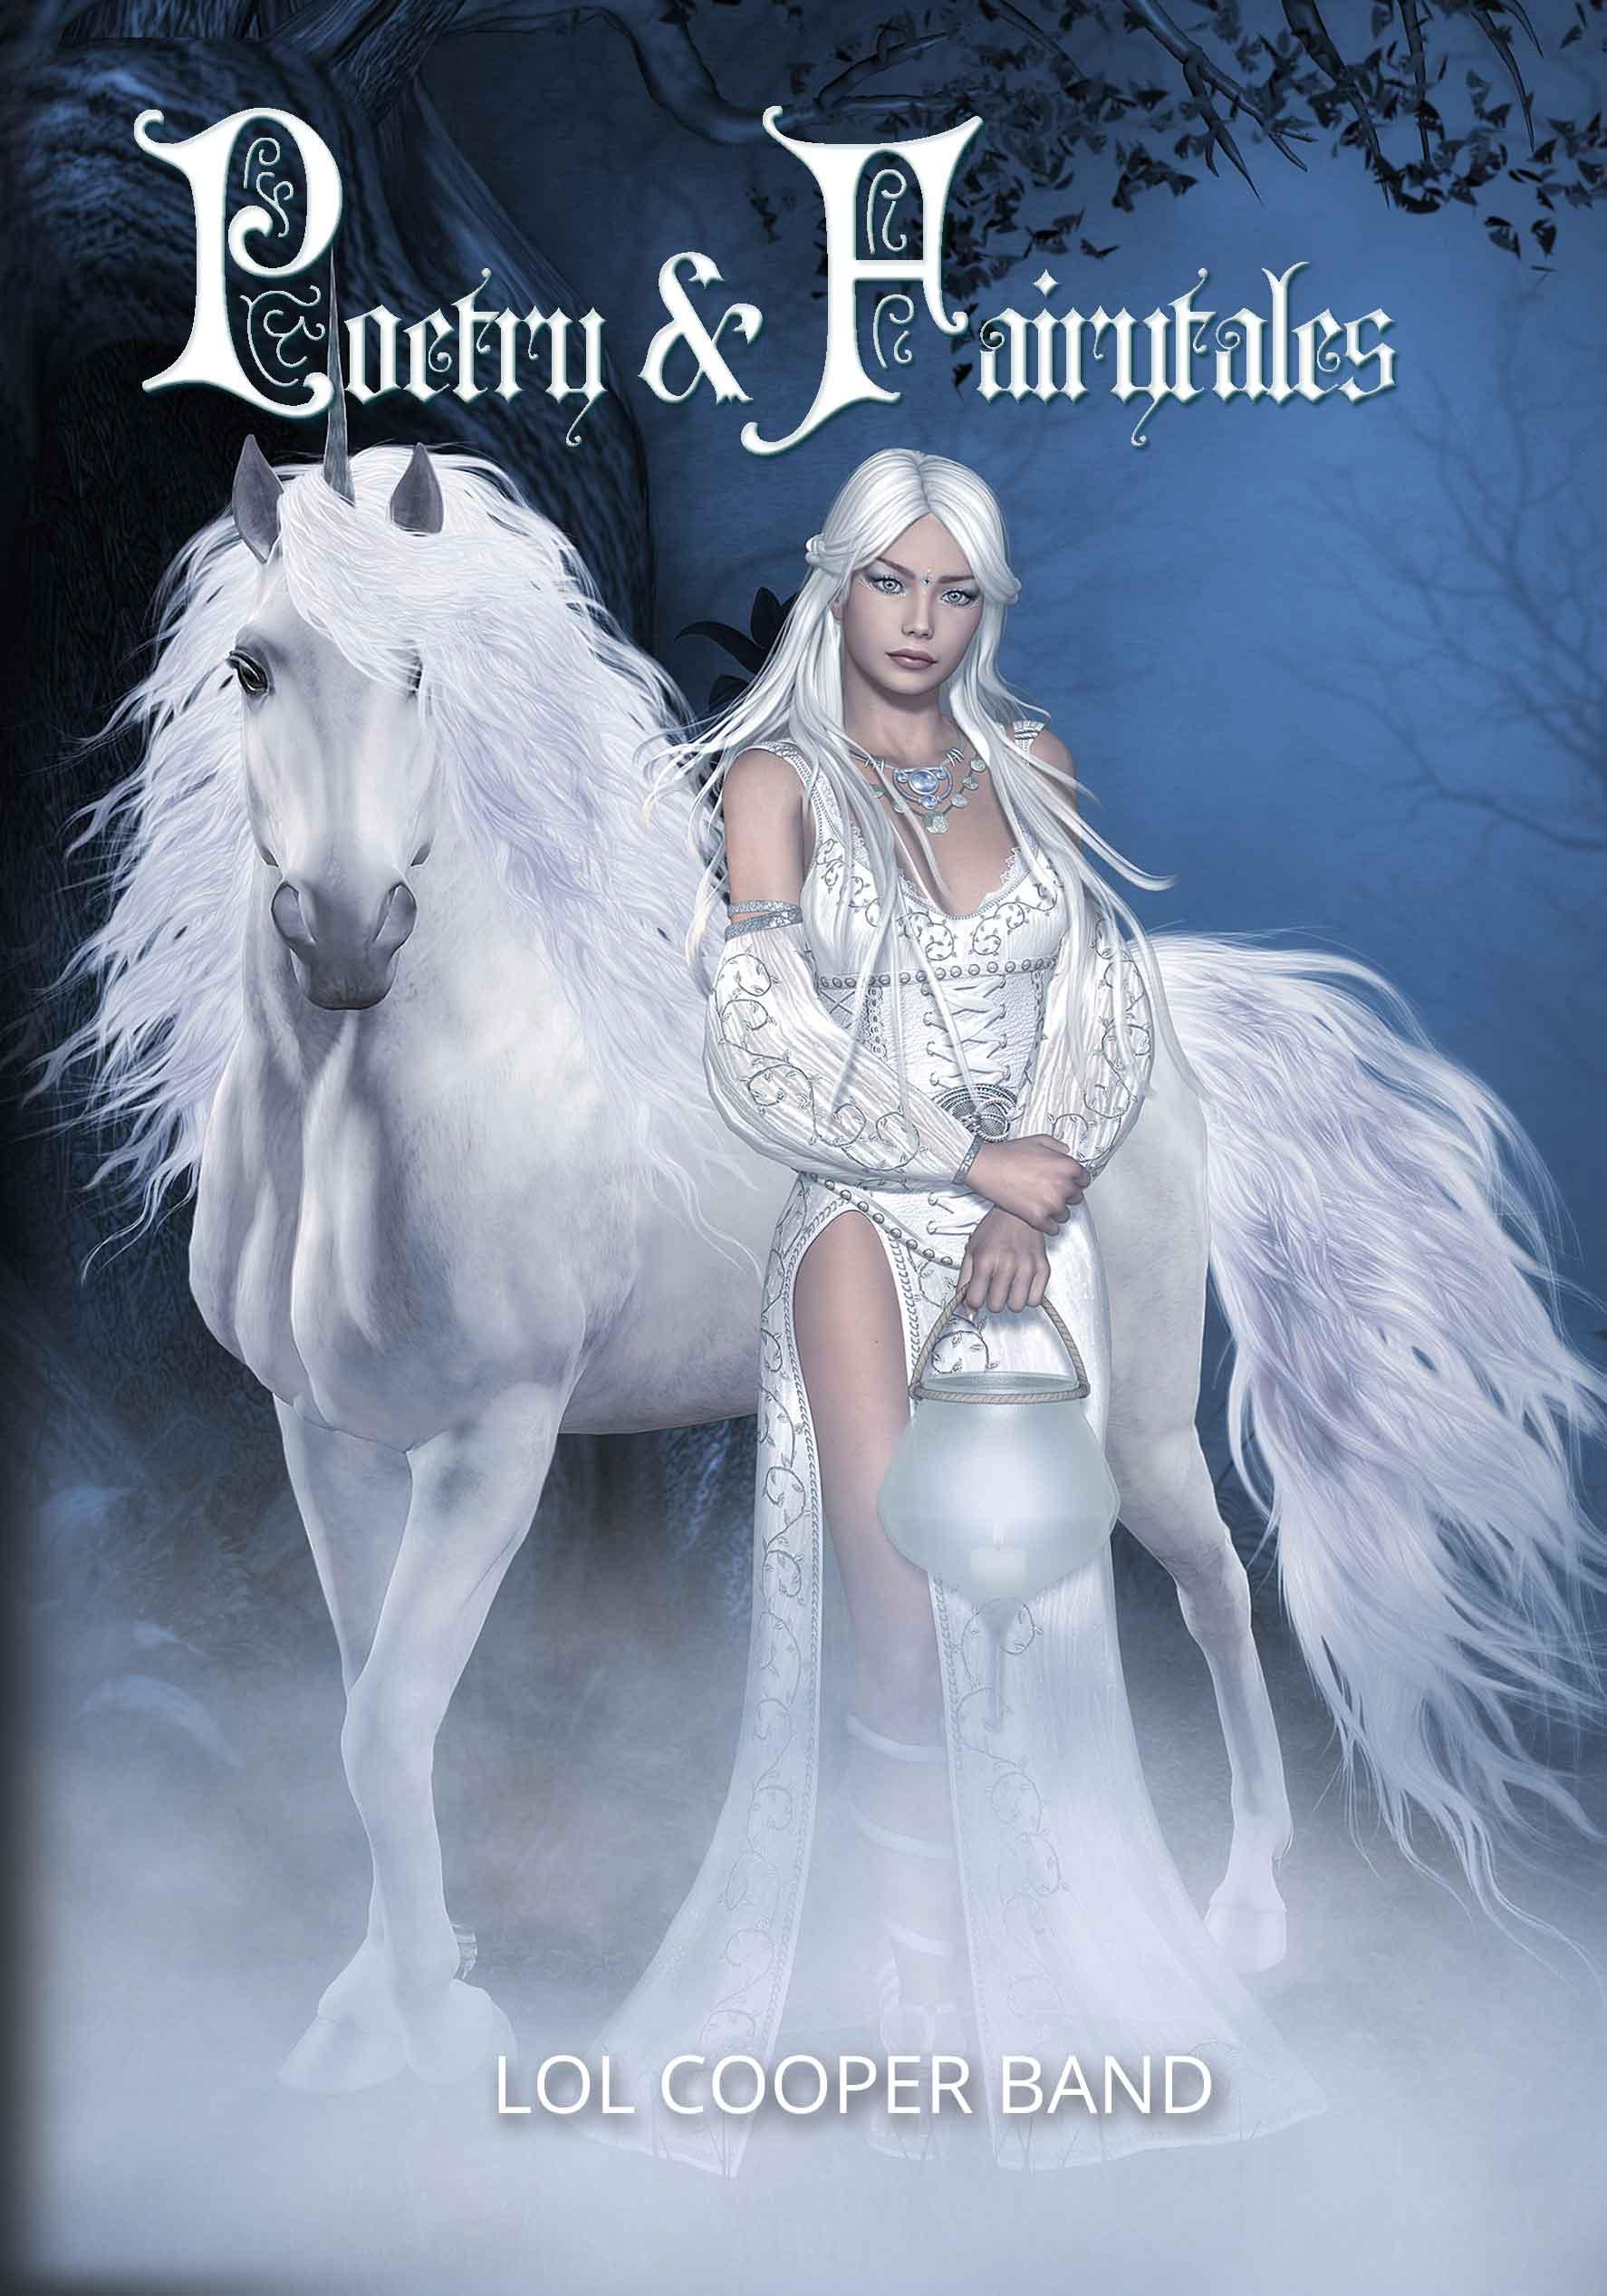 Poetry & Fairytales Book, CD Album & Music Video